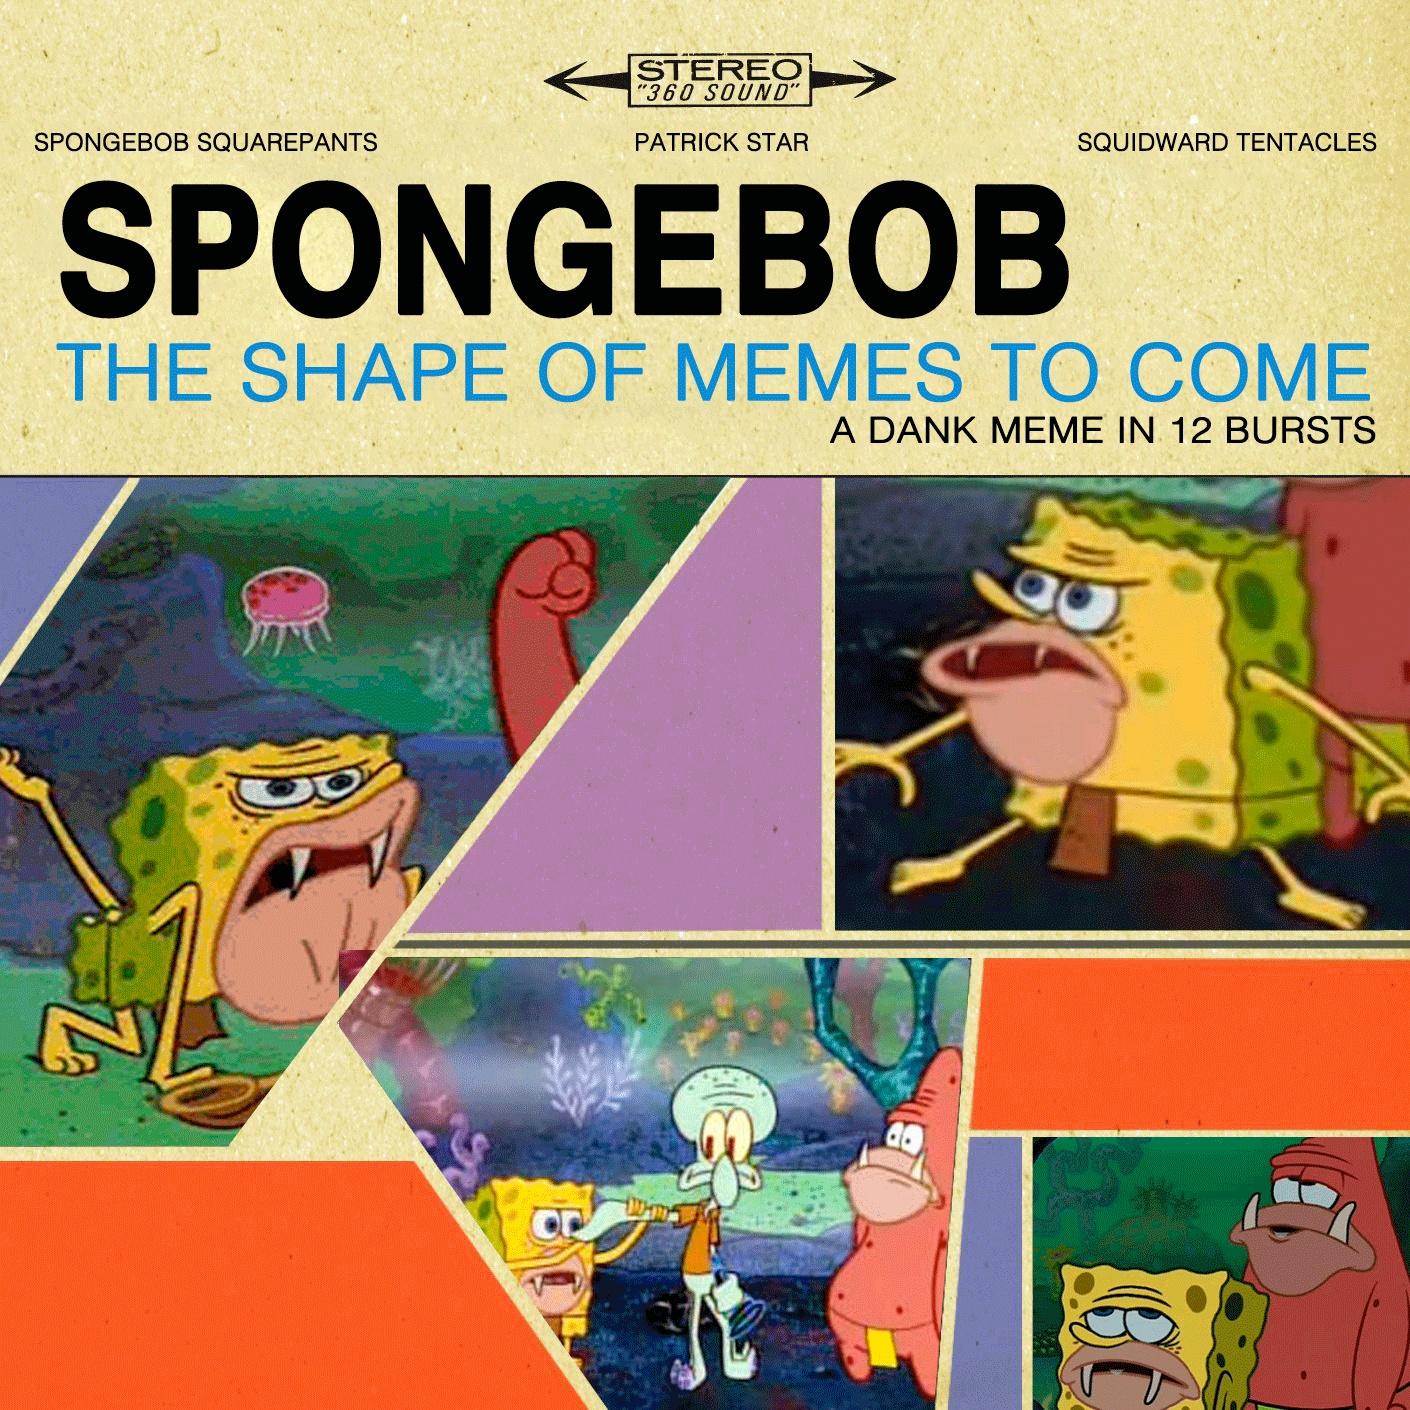 Funny Spongebob Caveman Meme : The shape of memes yet to come spongegar primitive